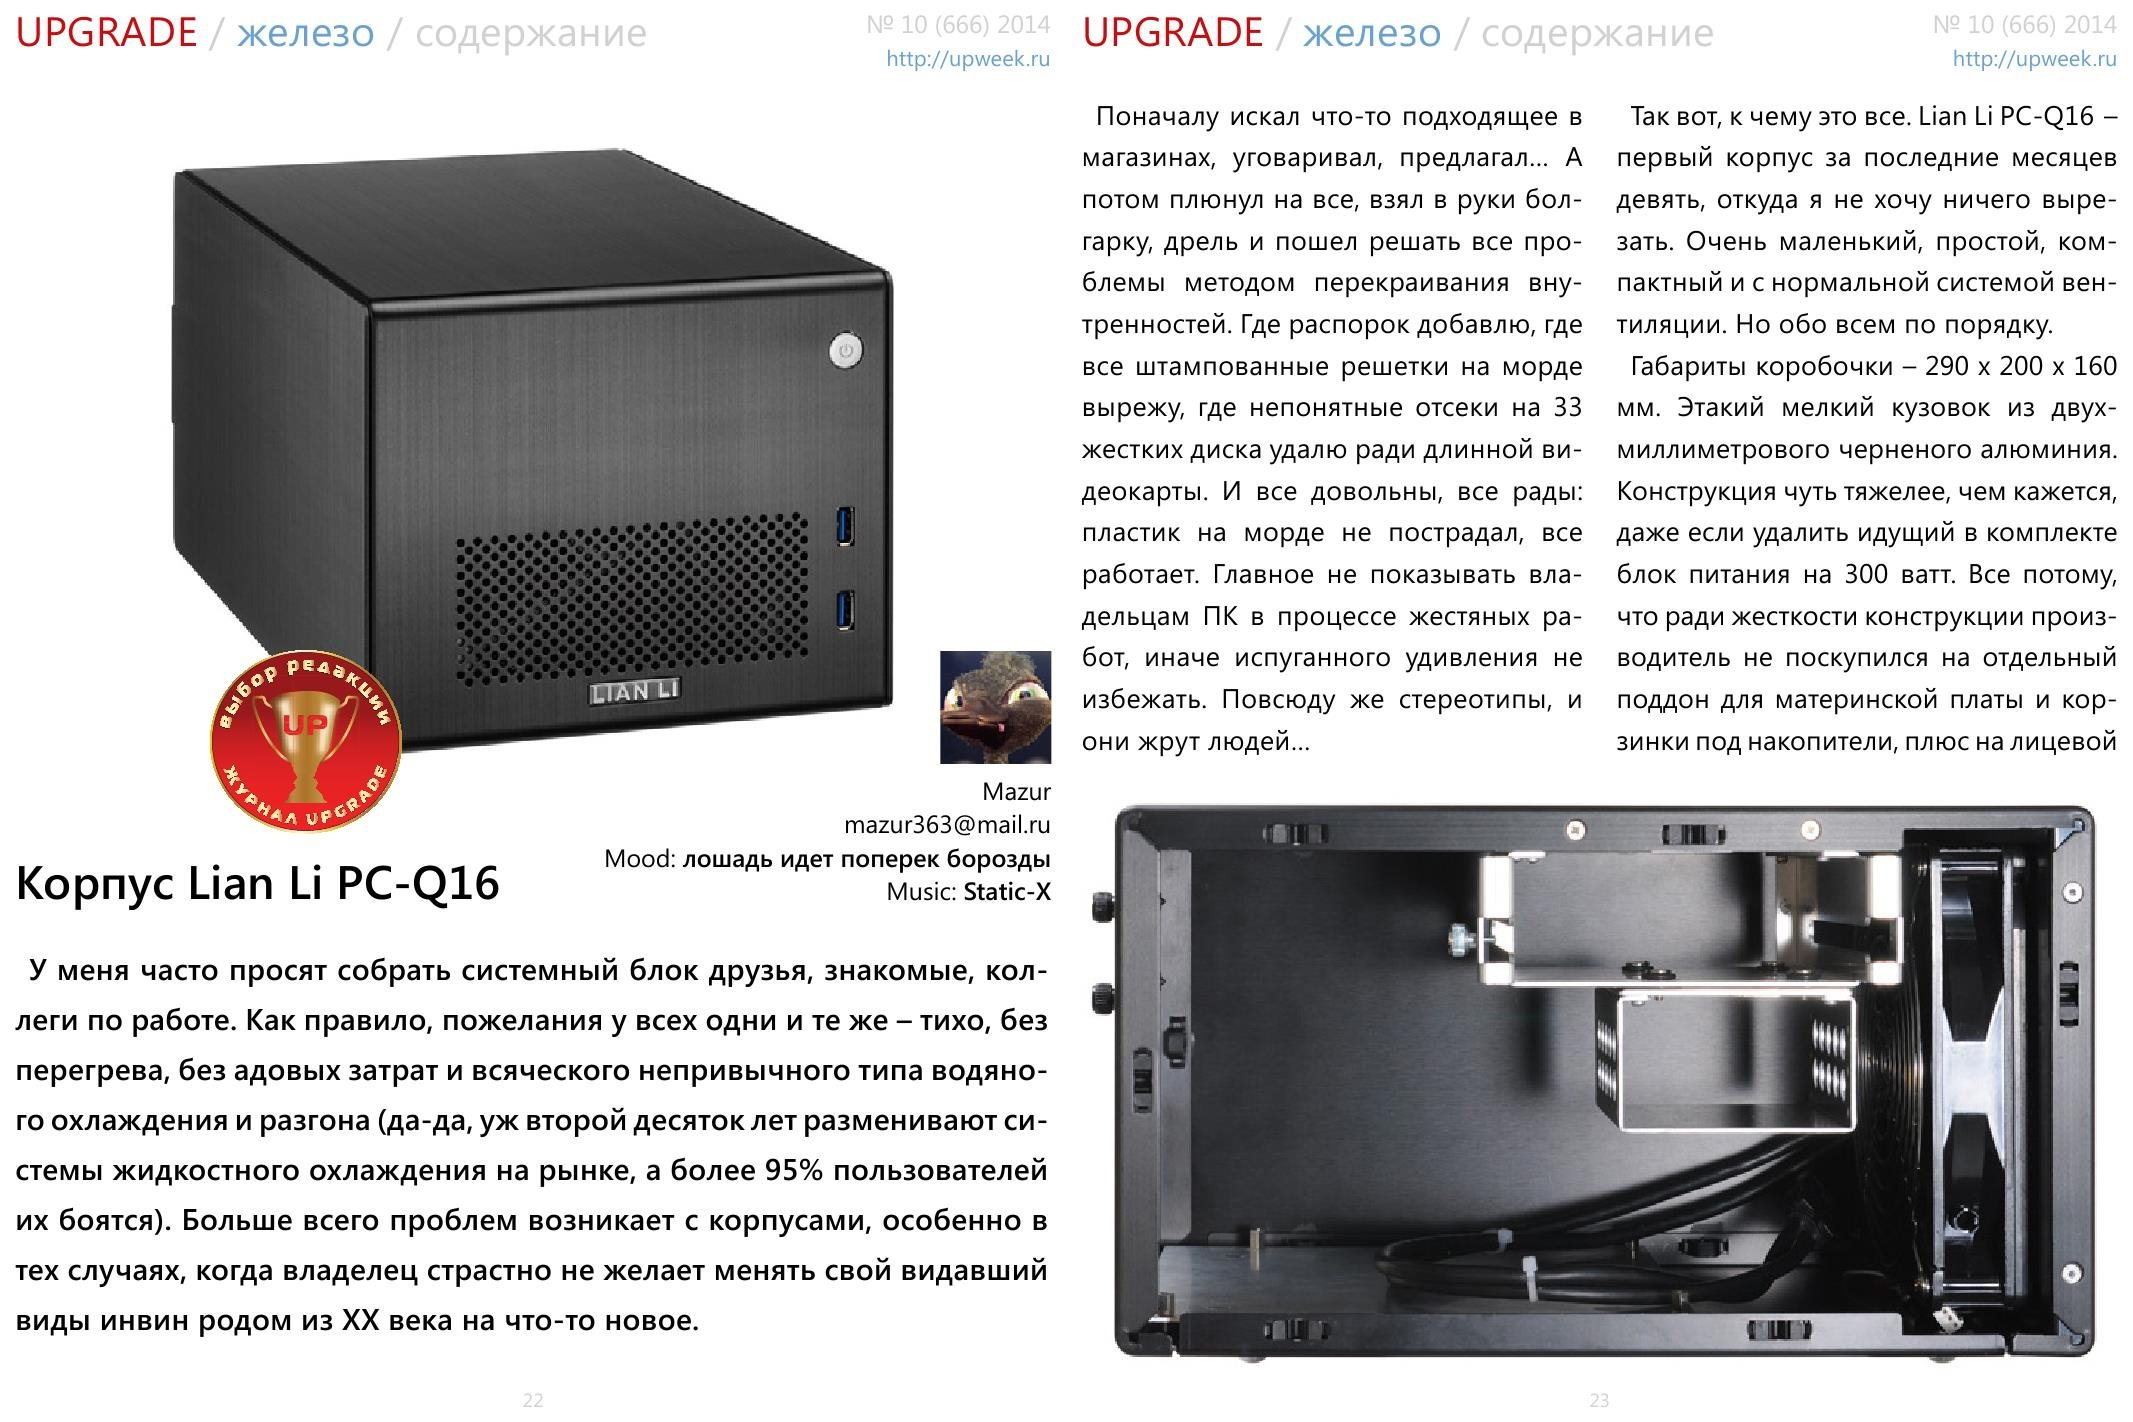 UPgrade №10 (666) (март 2014) PDF